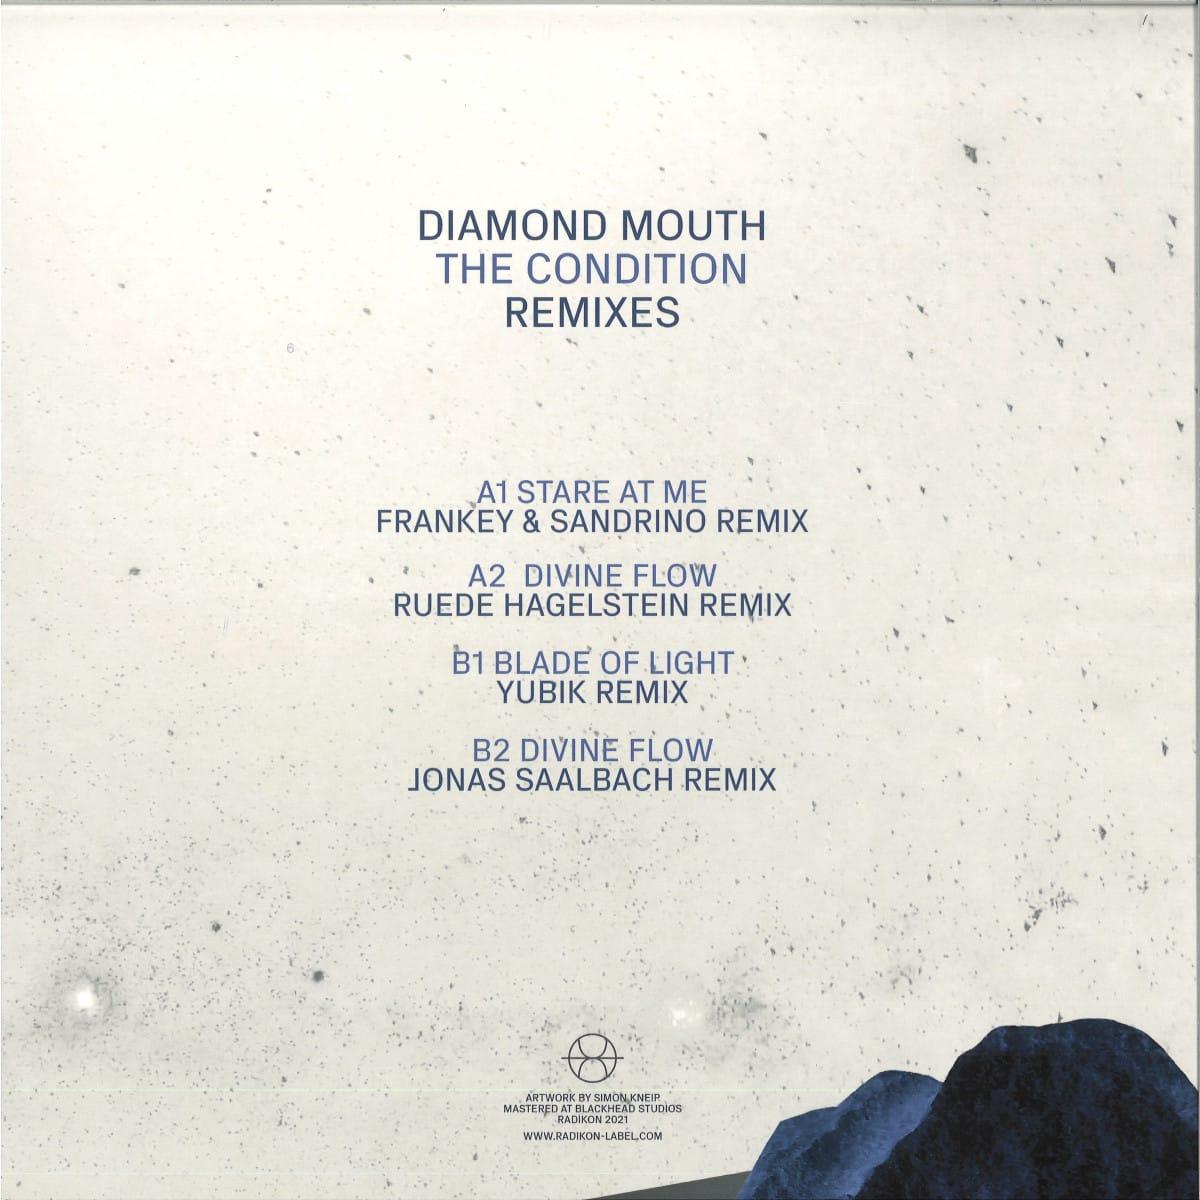 Diamond Mouth Remixes. Frankey & Sandrino, Ruede Hagelstein, Yubik, Jonas Saalbach. Radikon Vinyl Release.